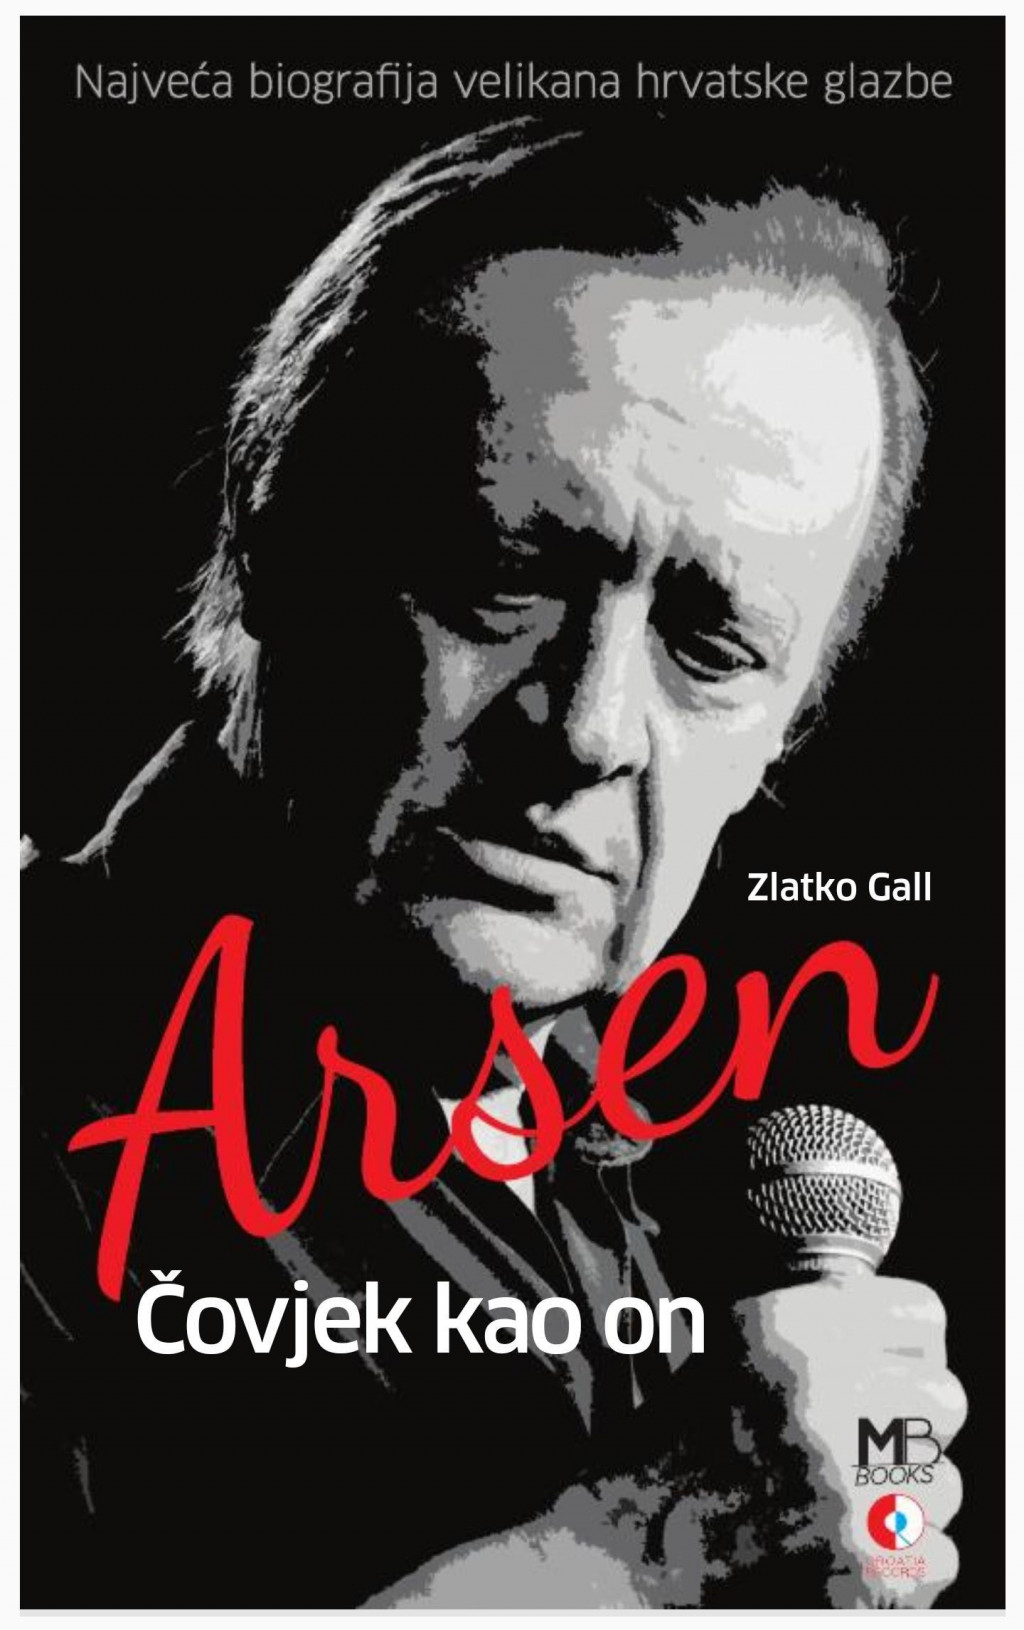 Zlatko Gall: 'Arsen – Čovjek kao on' (Media Bar/Croatia Records, Zagreb)<br /> <br />